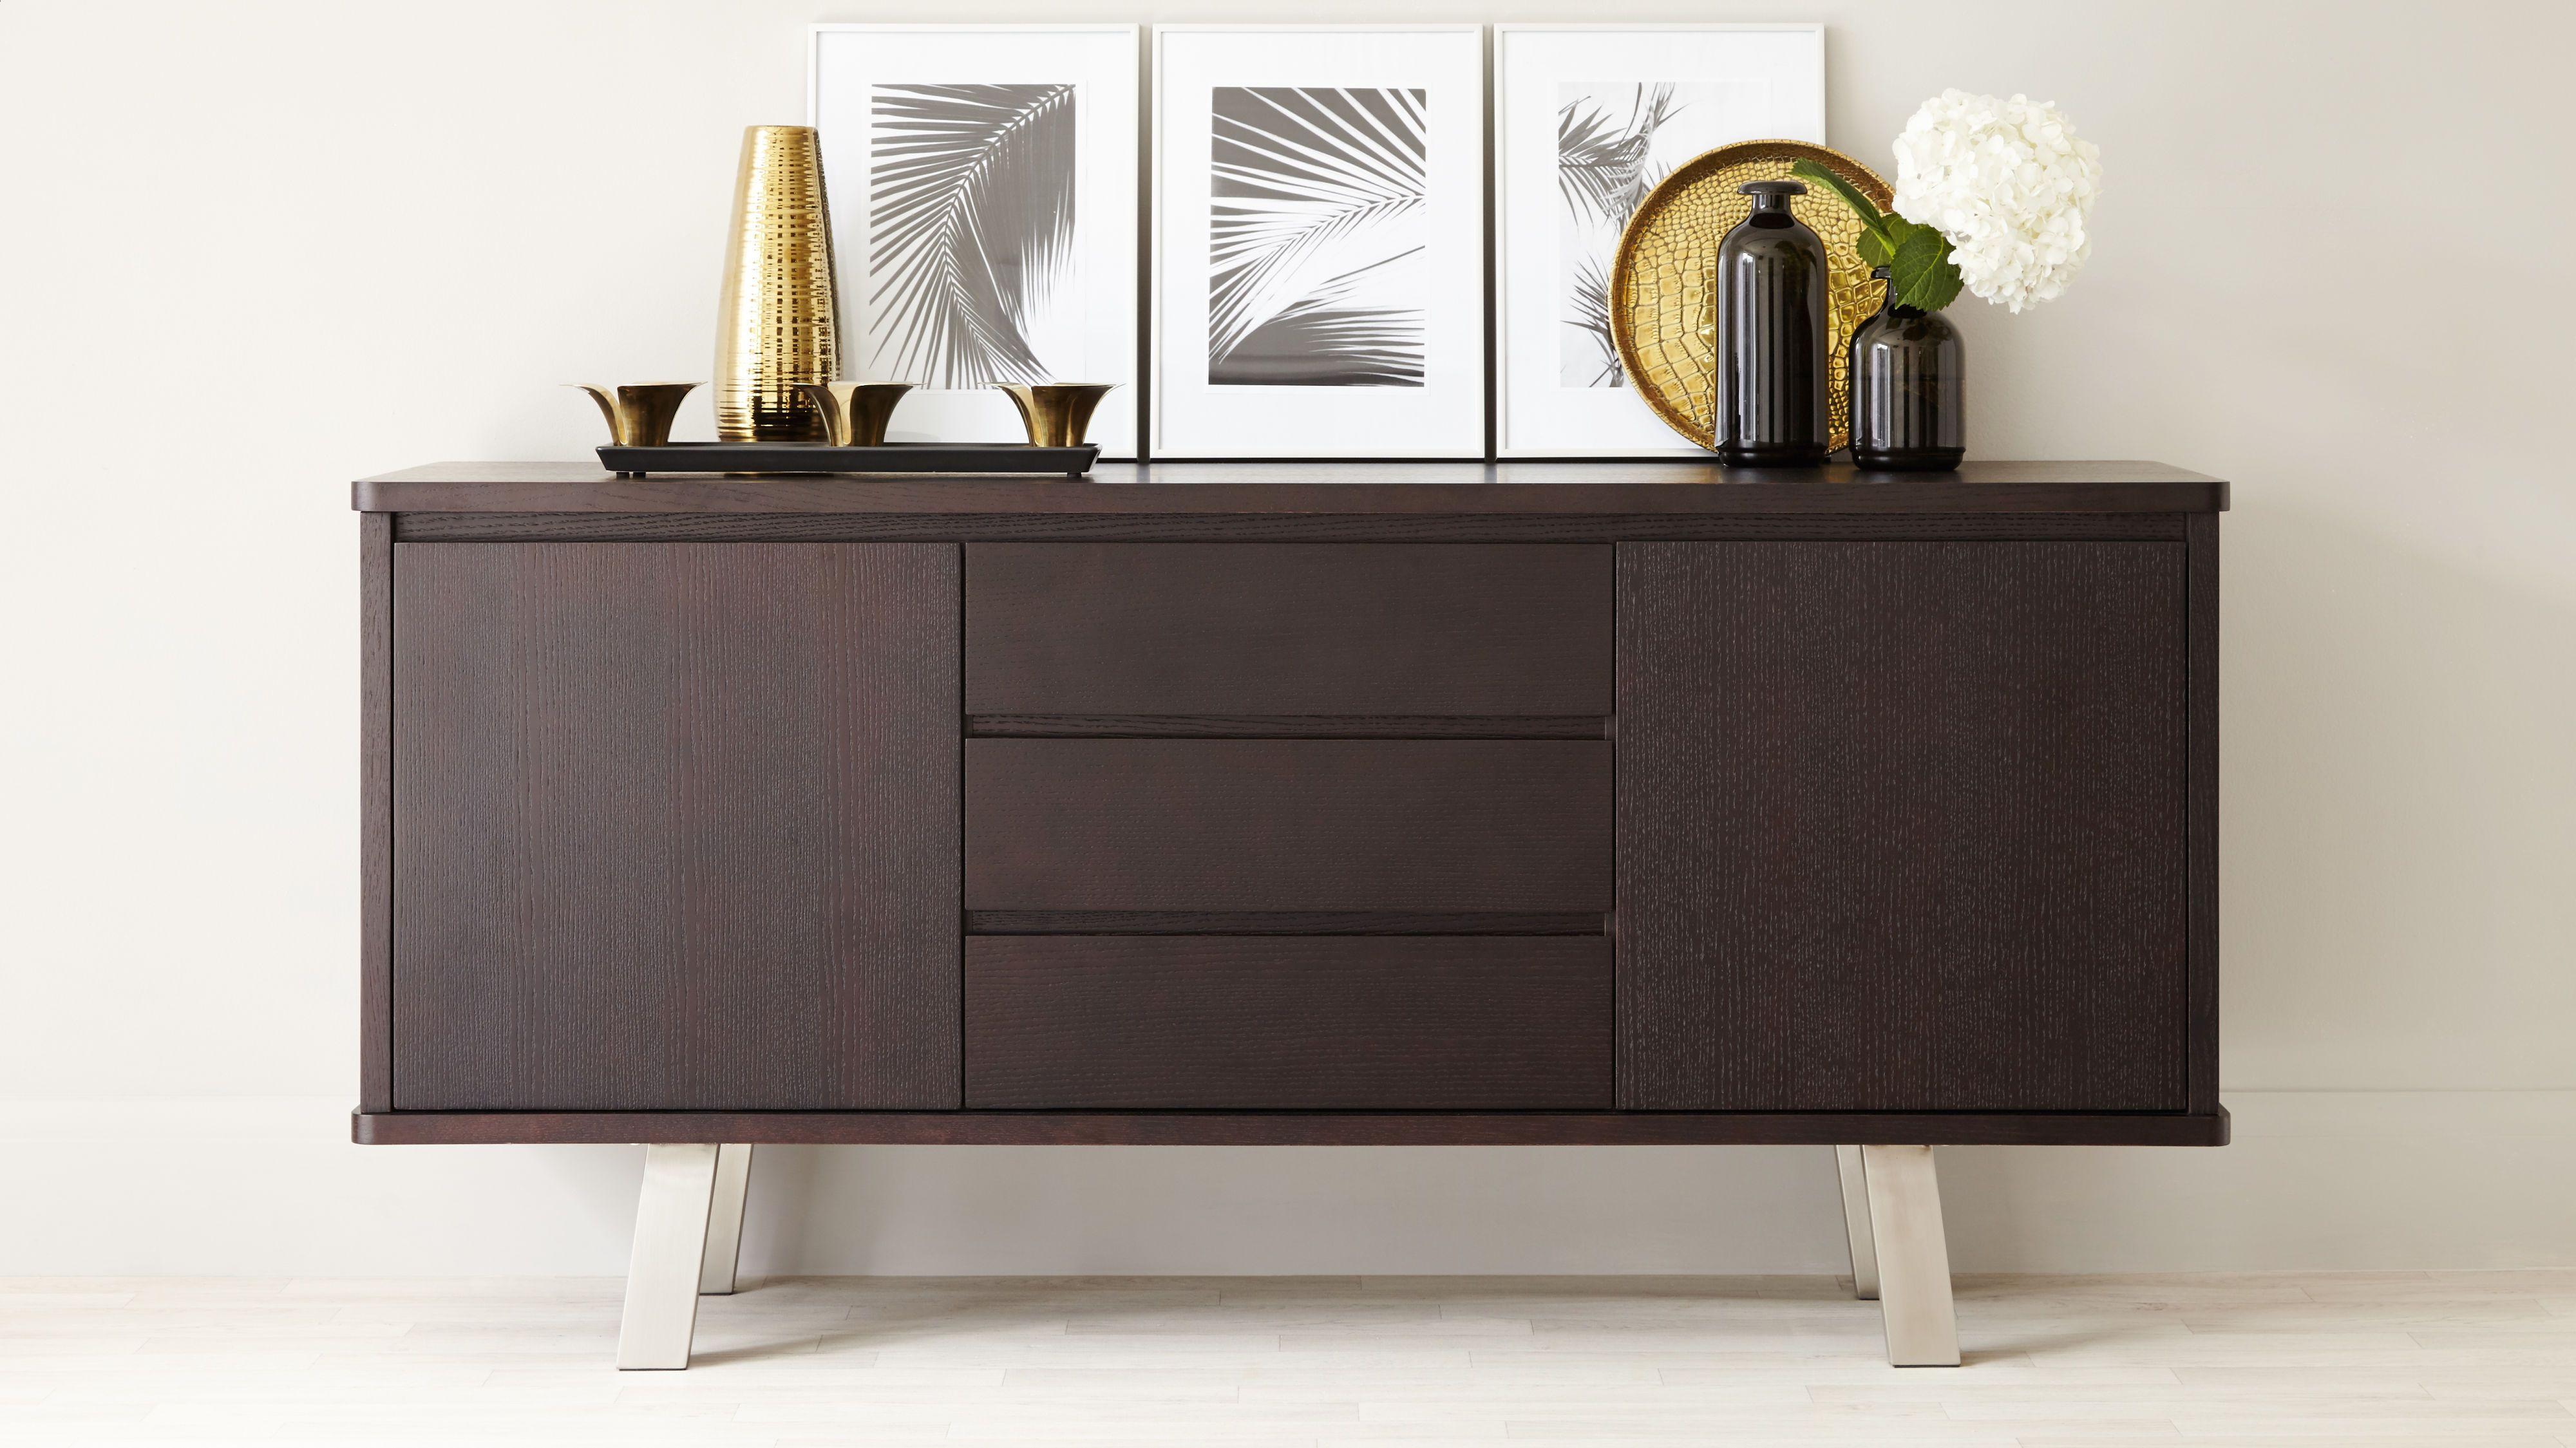 Credenza Dark Wood : Holcomb gold accent credenza cabinets dark wood